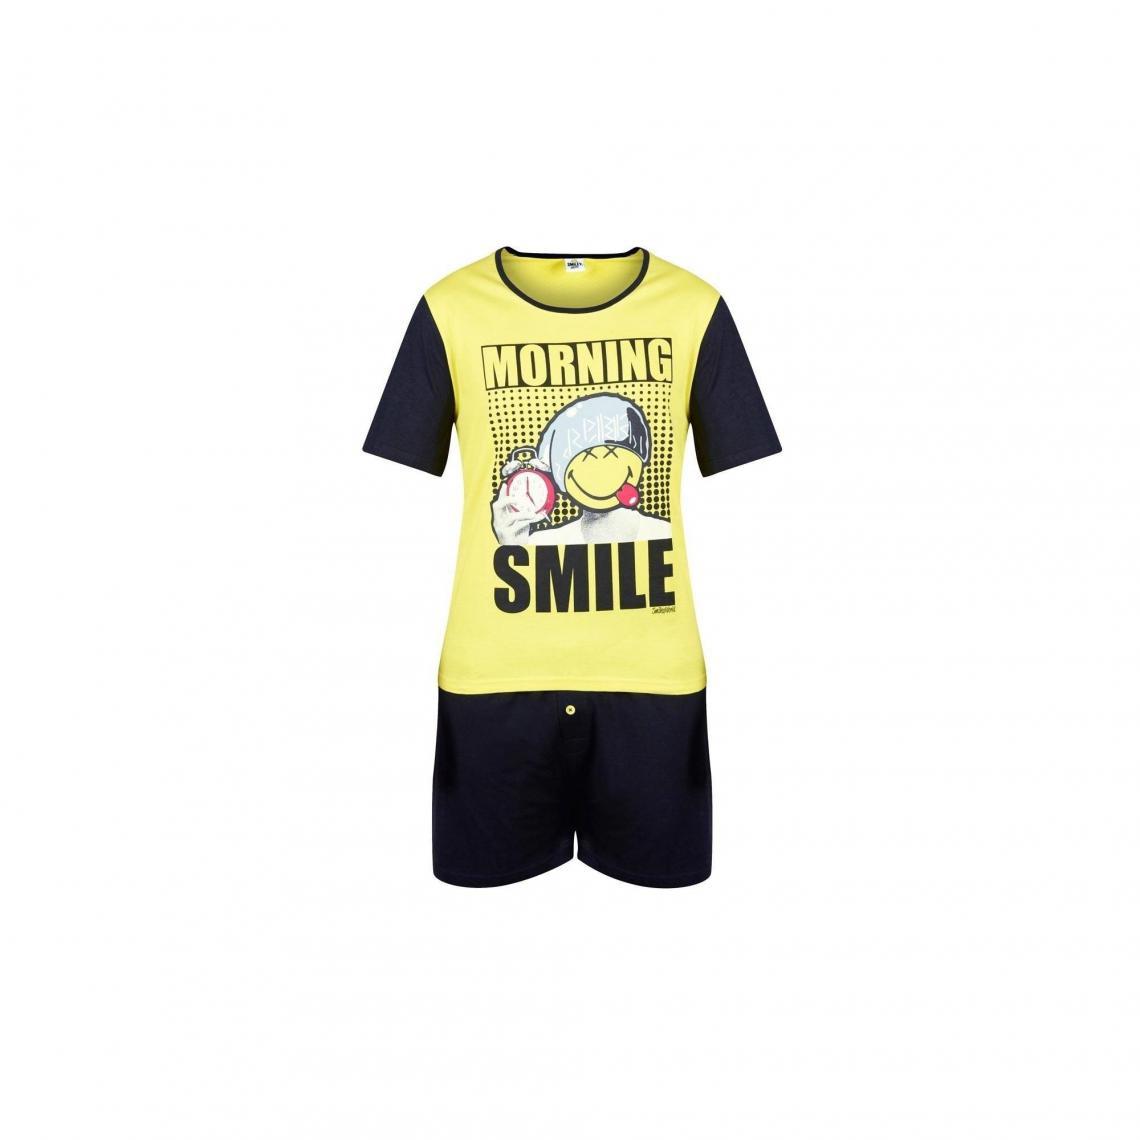 Pyjama court Morning Smile by Smiley POMM'POIRE - Jaune - 3Suisses